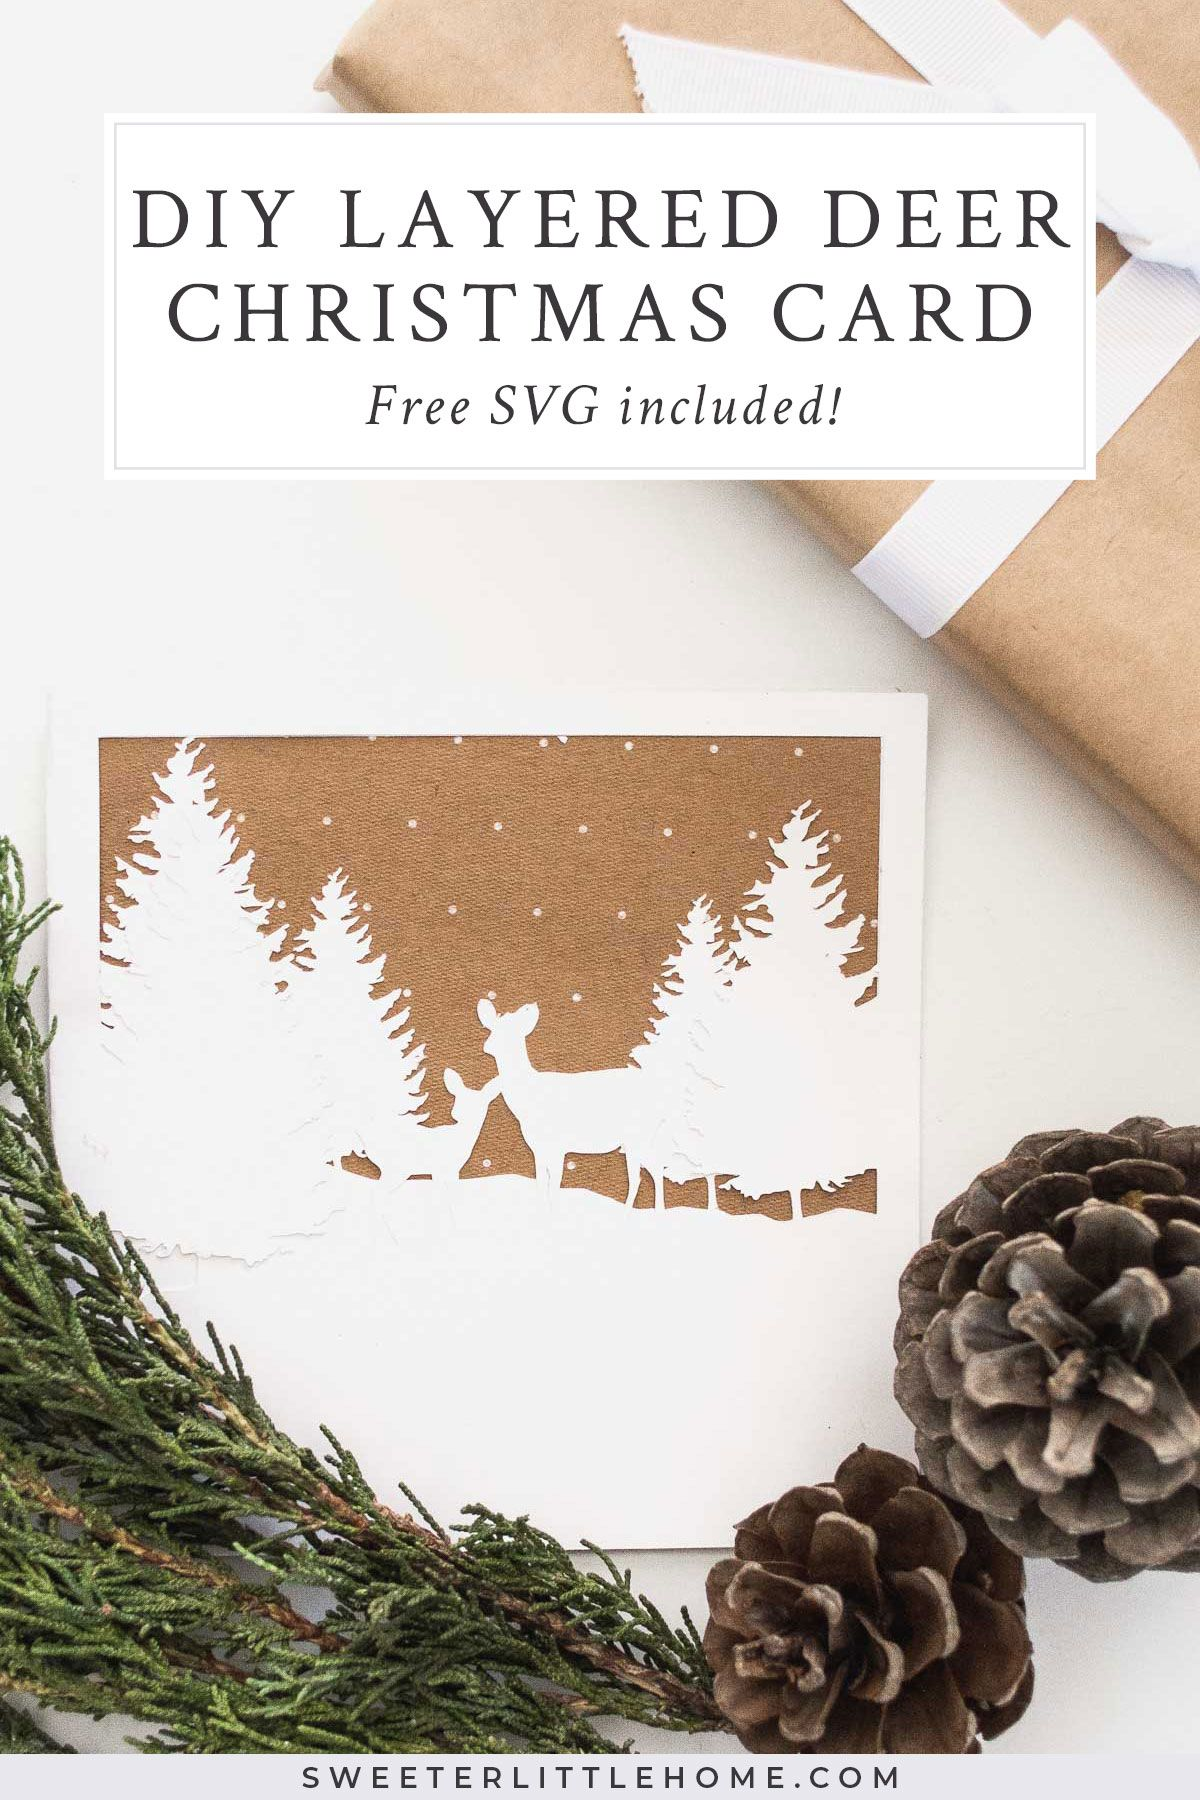 Deer Christmas Card Free SVG included! Cricut